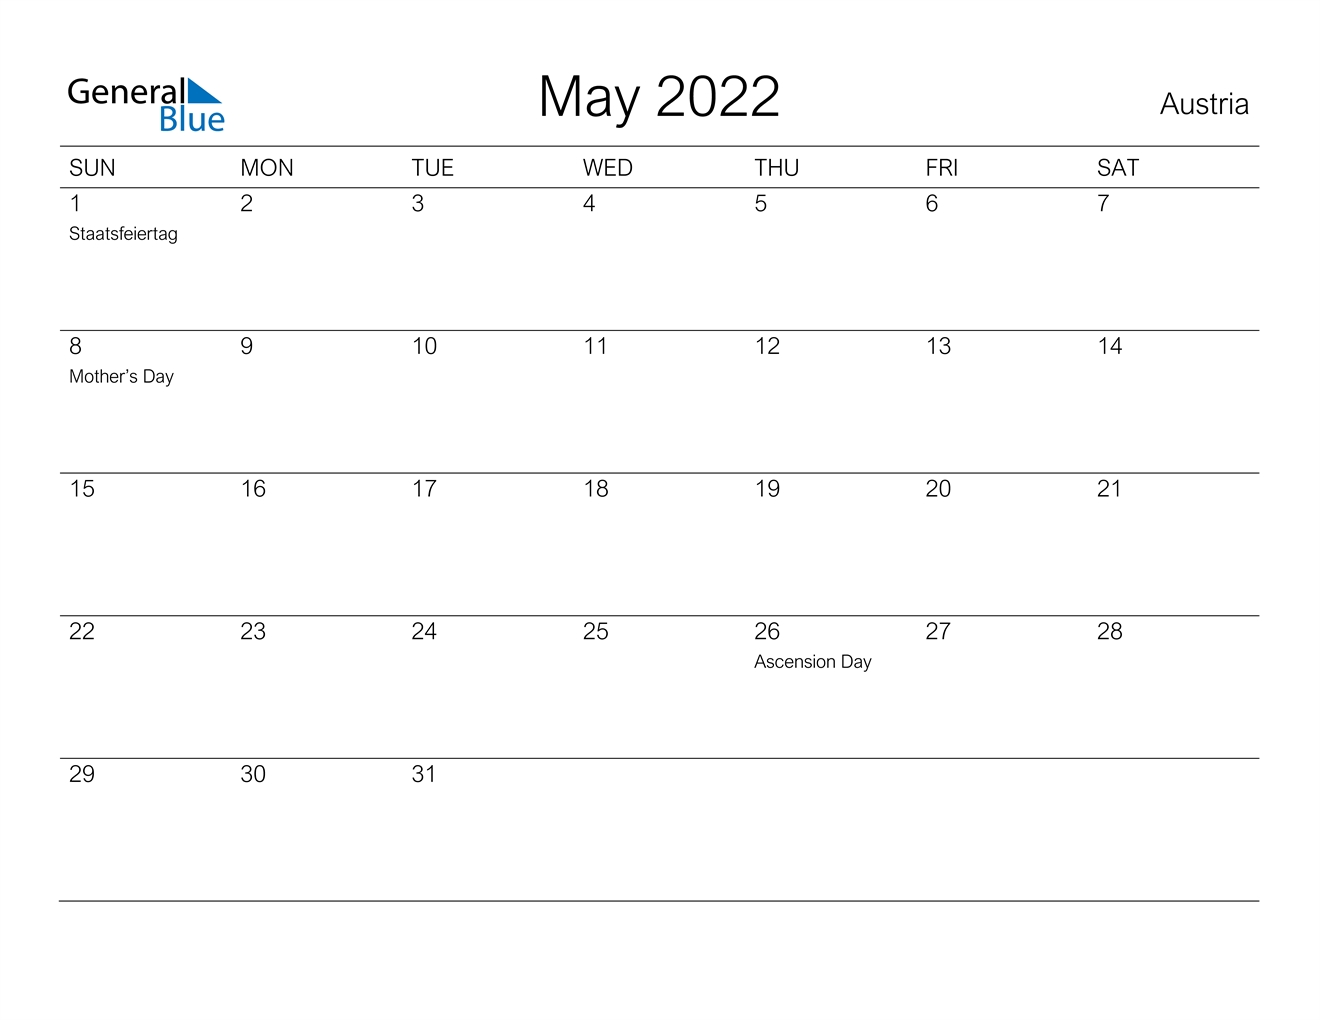 May 2022 Calendar - Austria